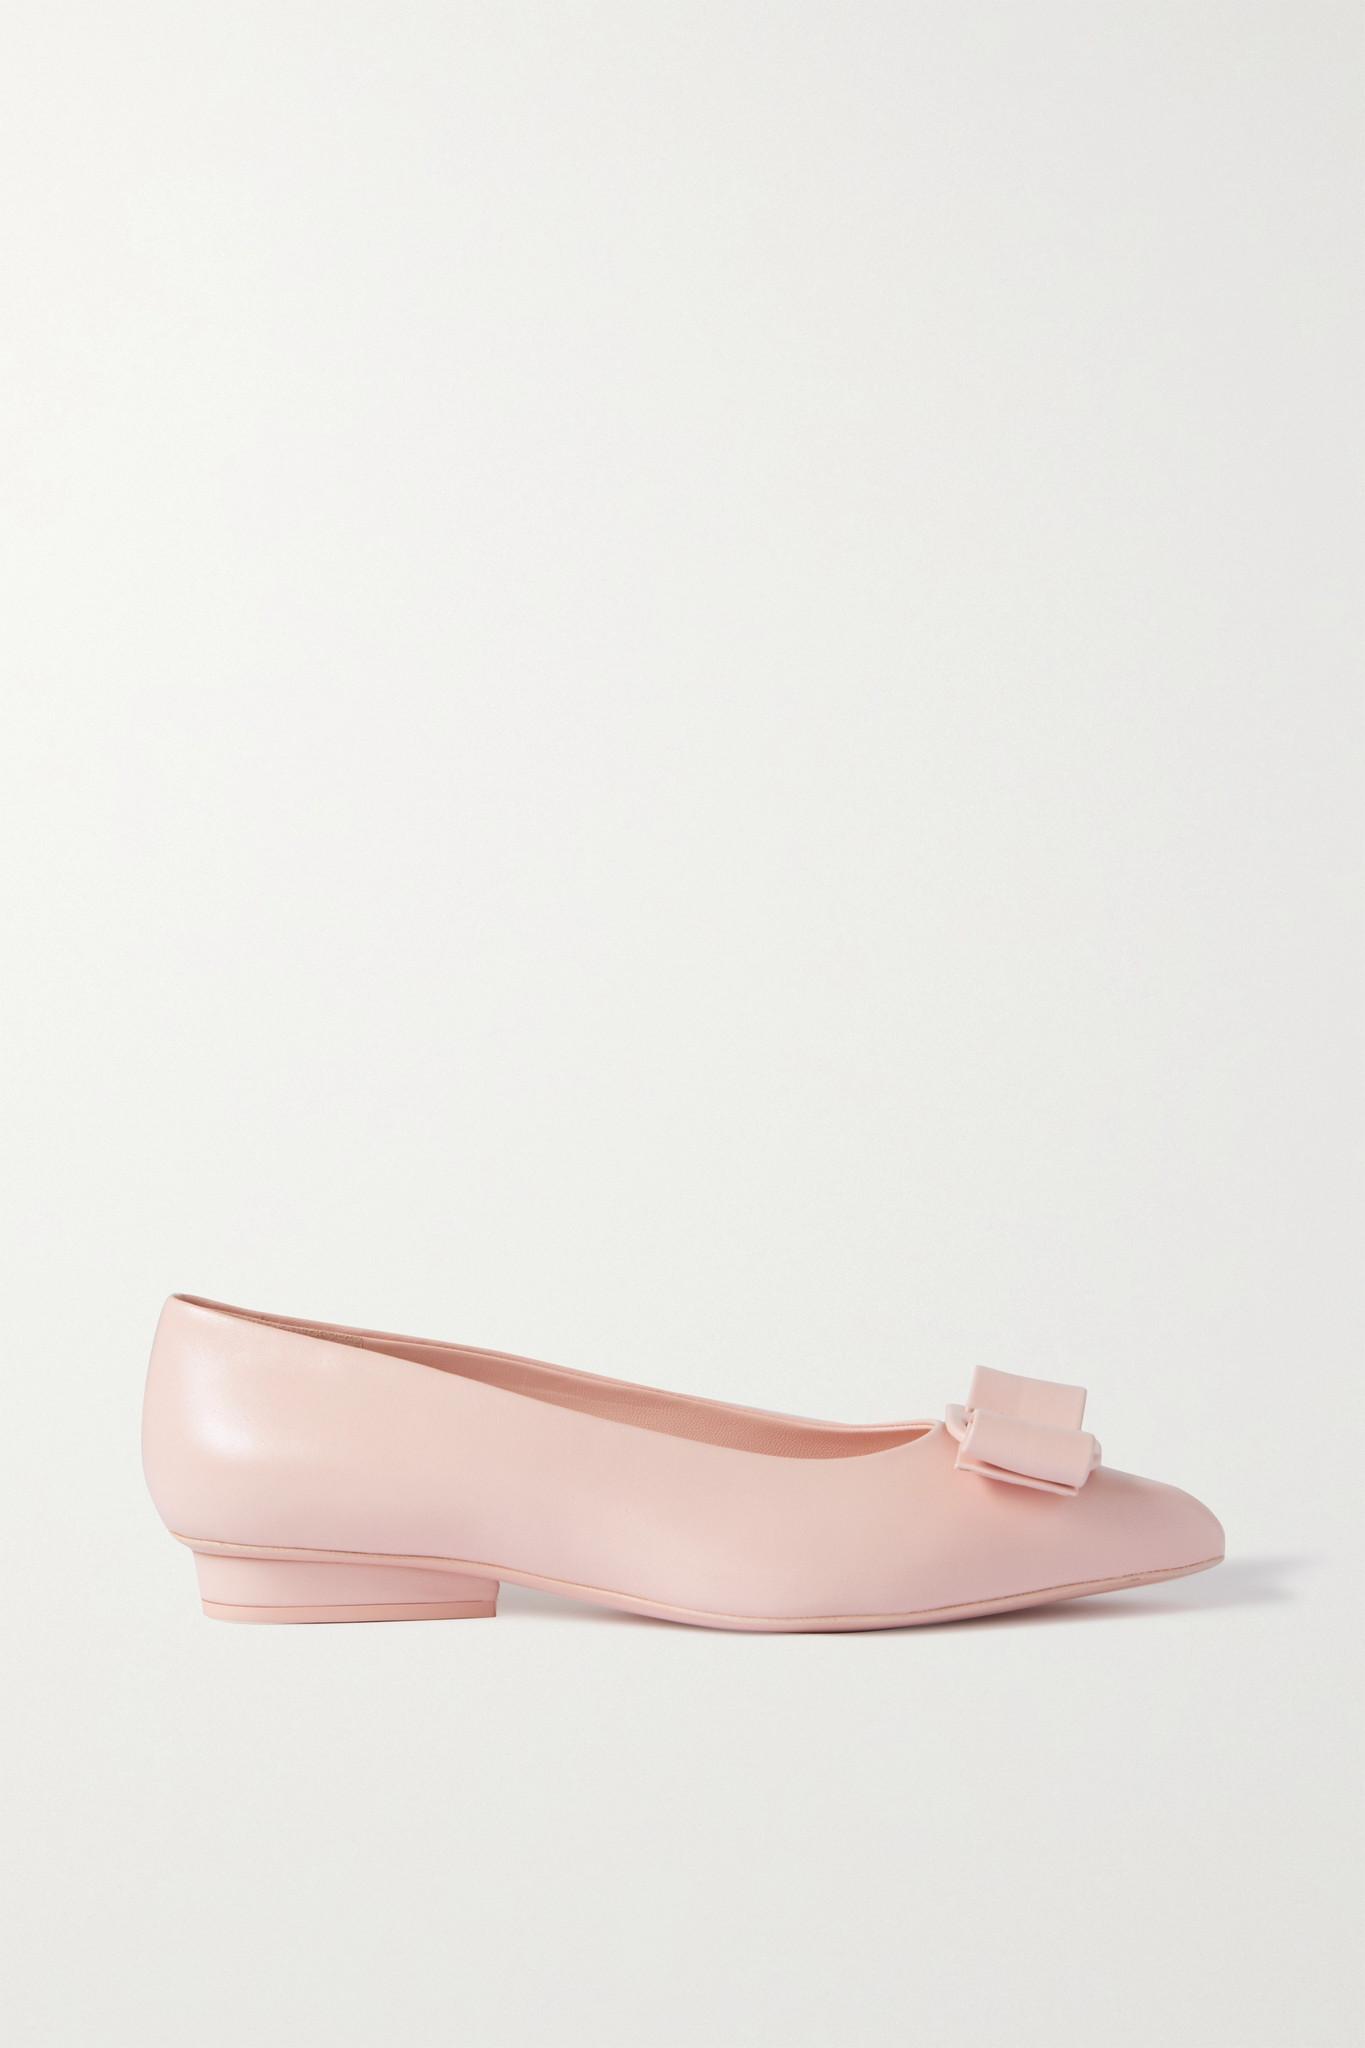 SALVATORE FERRAGAMO - Viva 蝴蝶结缀饰皮革尖头浅口鞋 - 粉红色 - US9.5